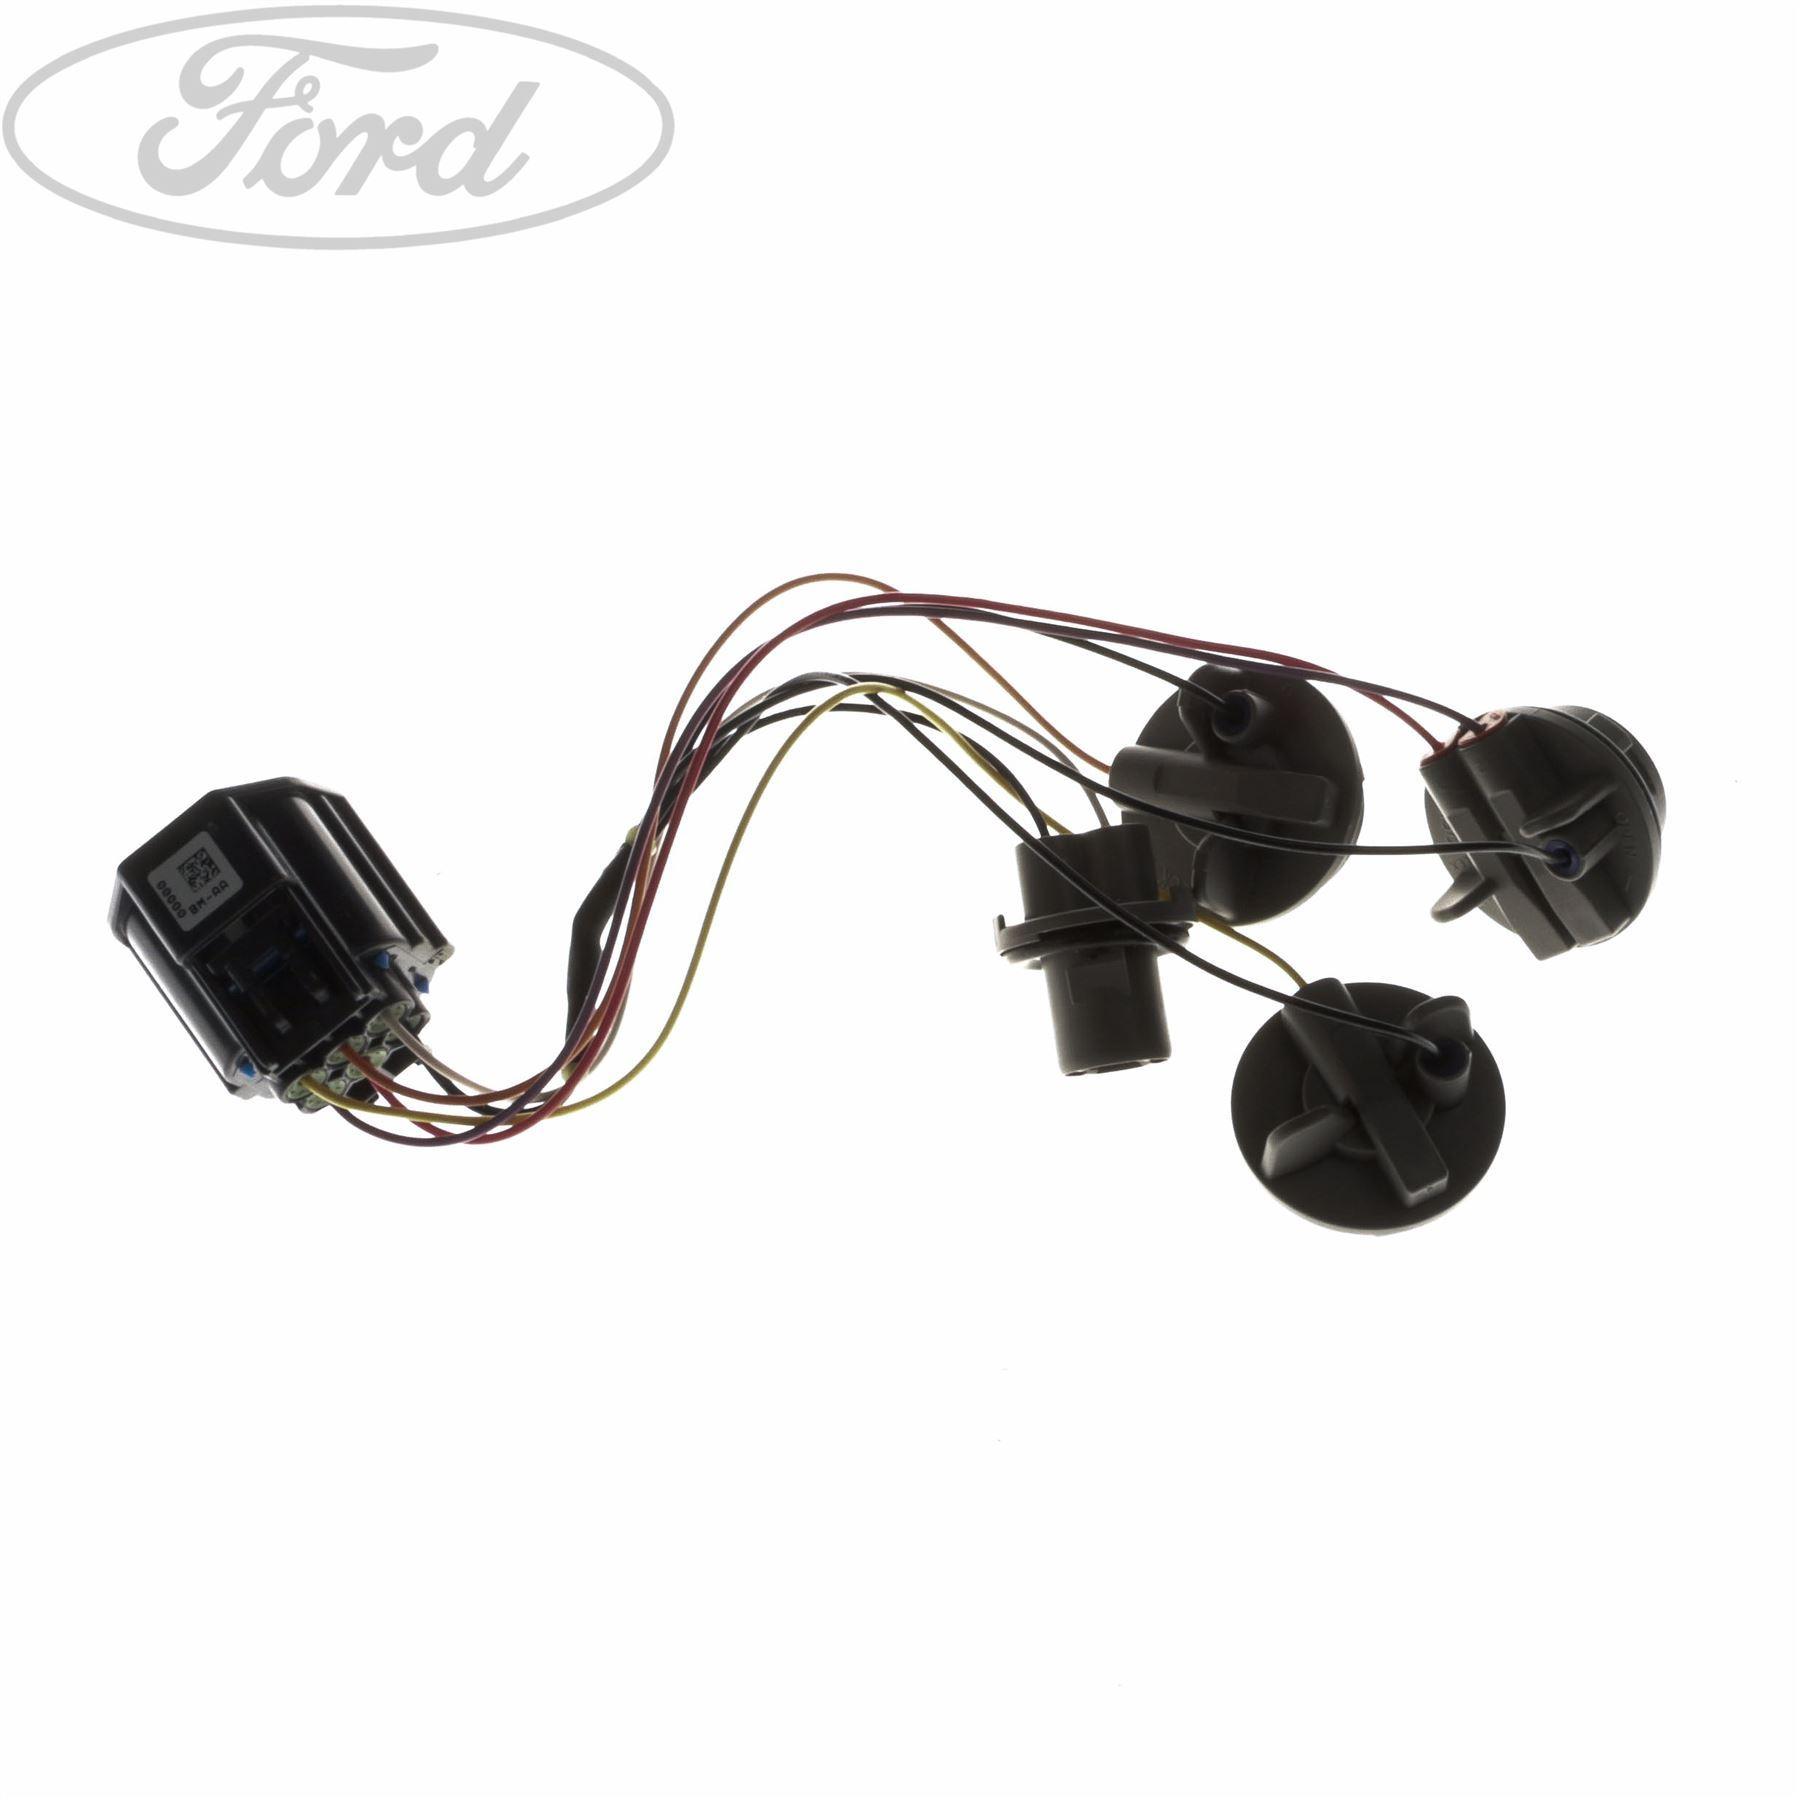 Genuine Ford Focus Mk3 Rear Lamp Bulb Holder Wiring 1709955 Ebay Metal Image Is Loading